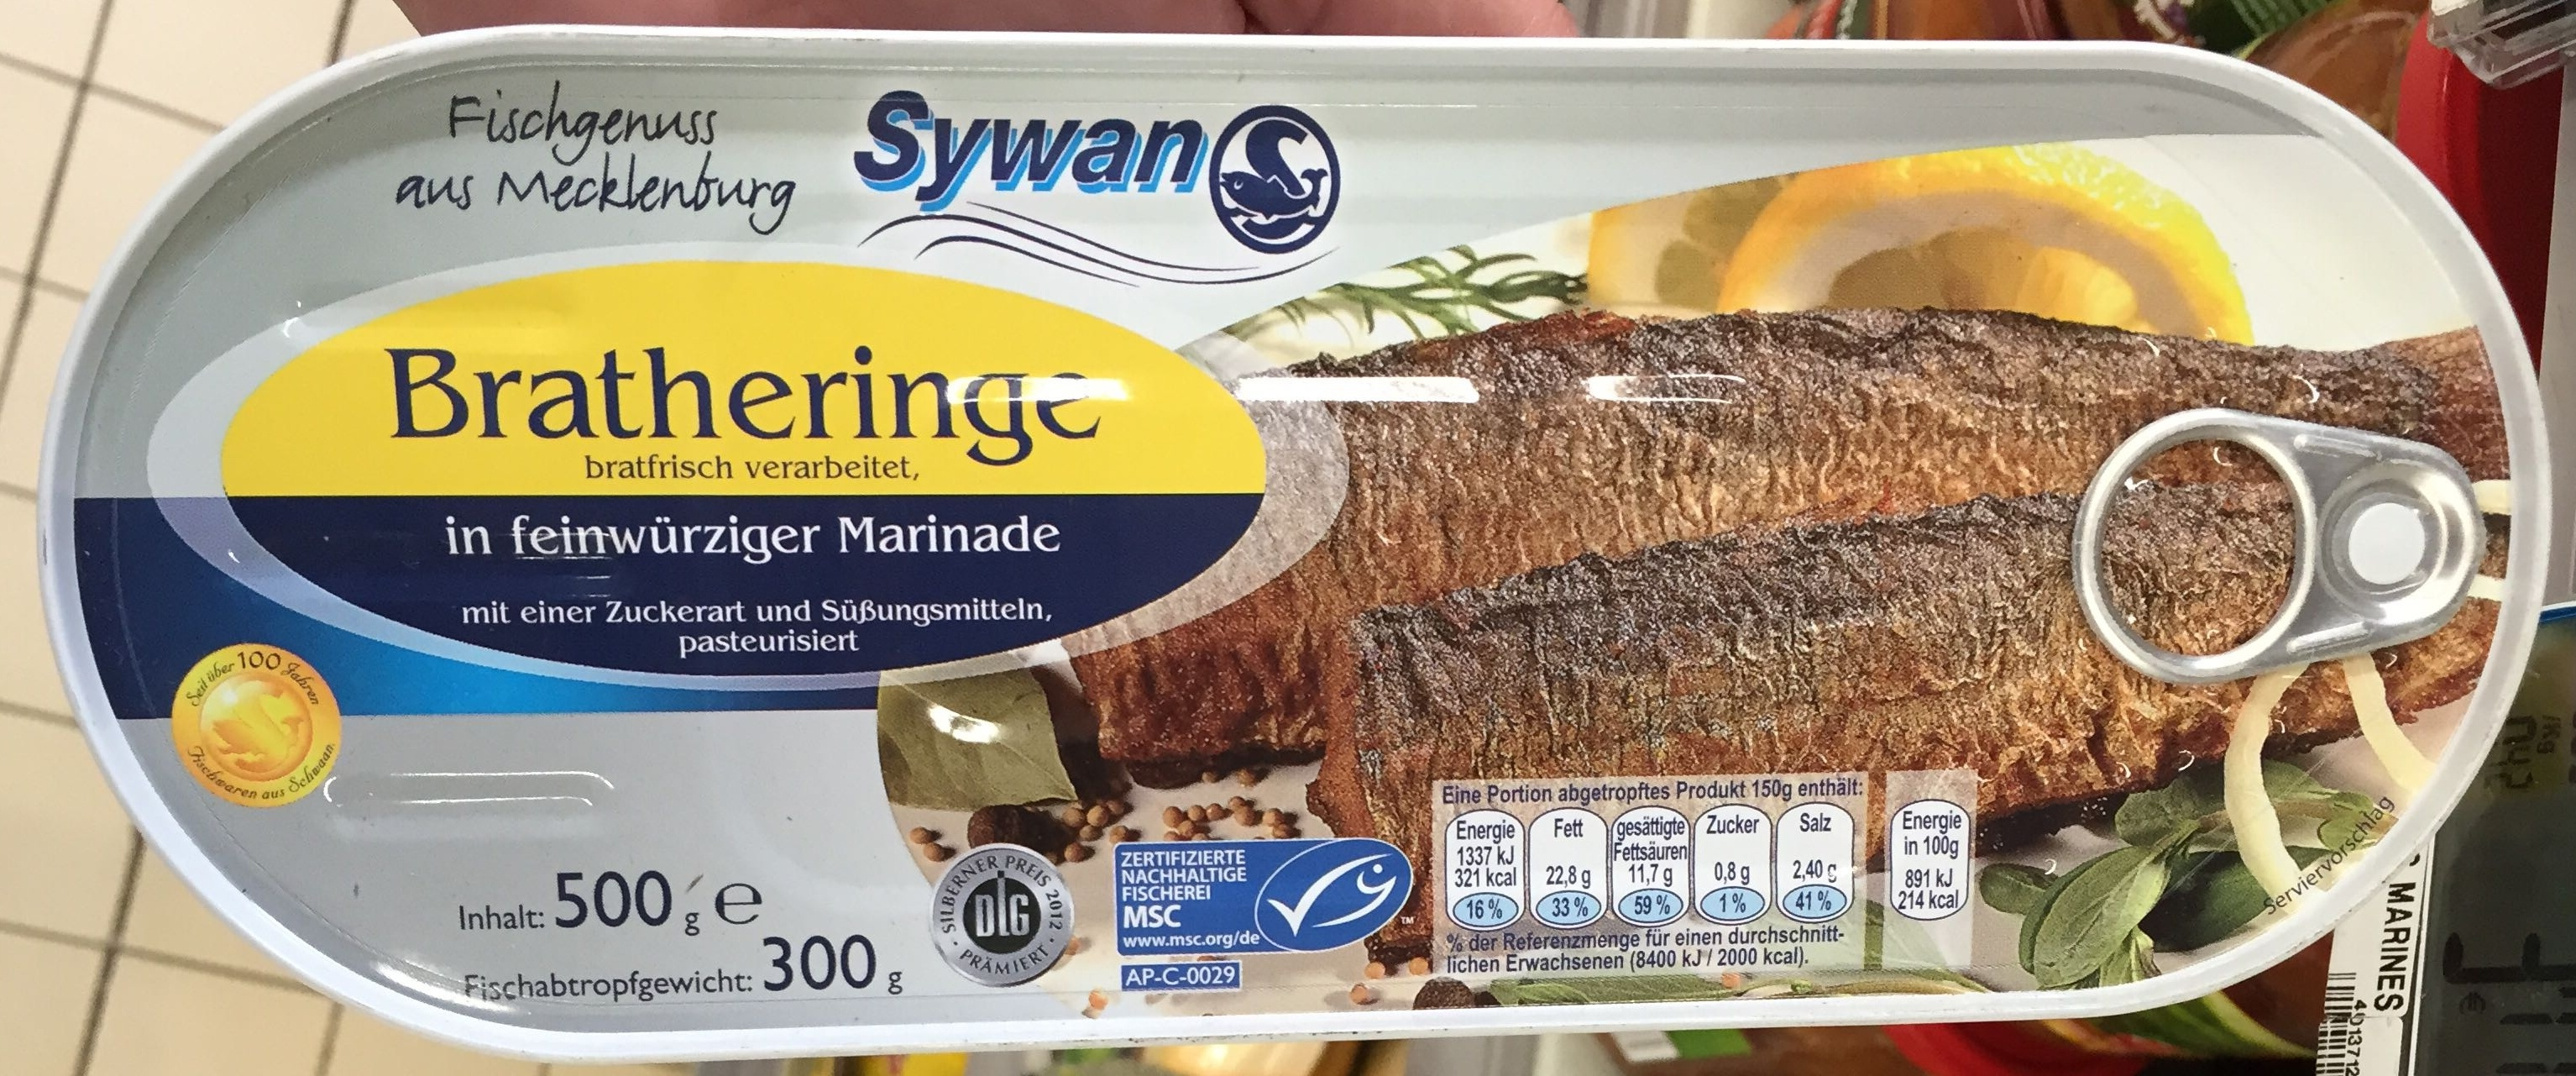 Bratheringe in feinwurziger marinade - Produit - fr